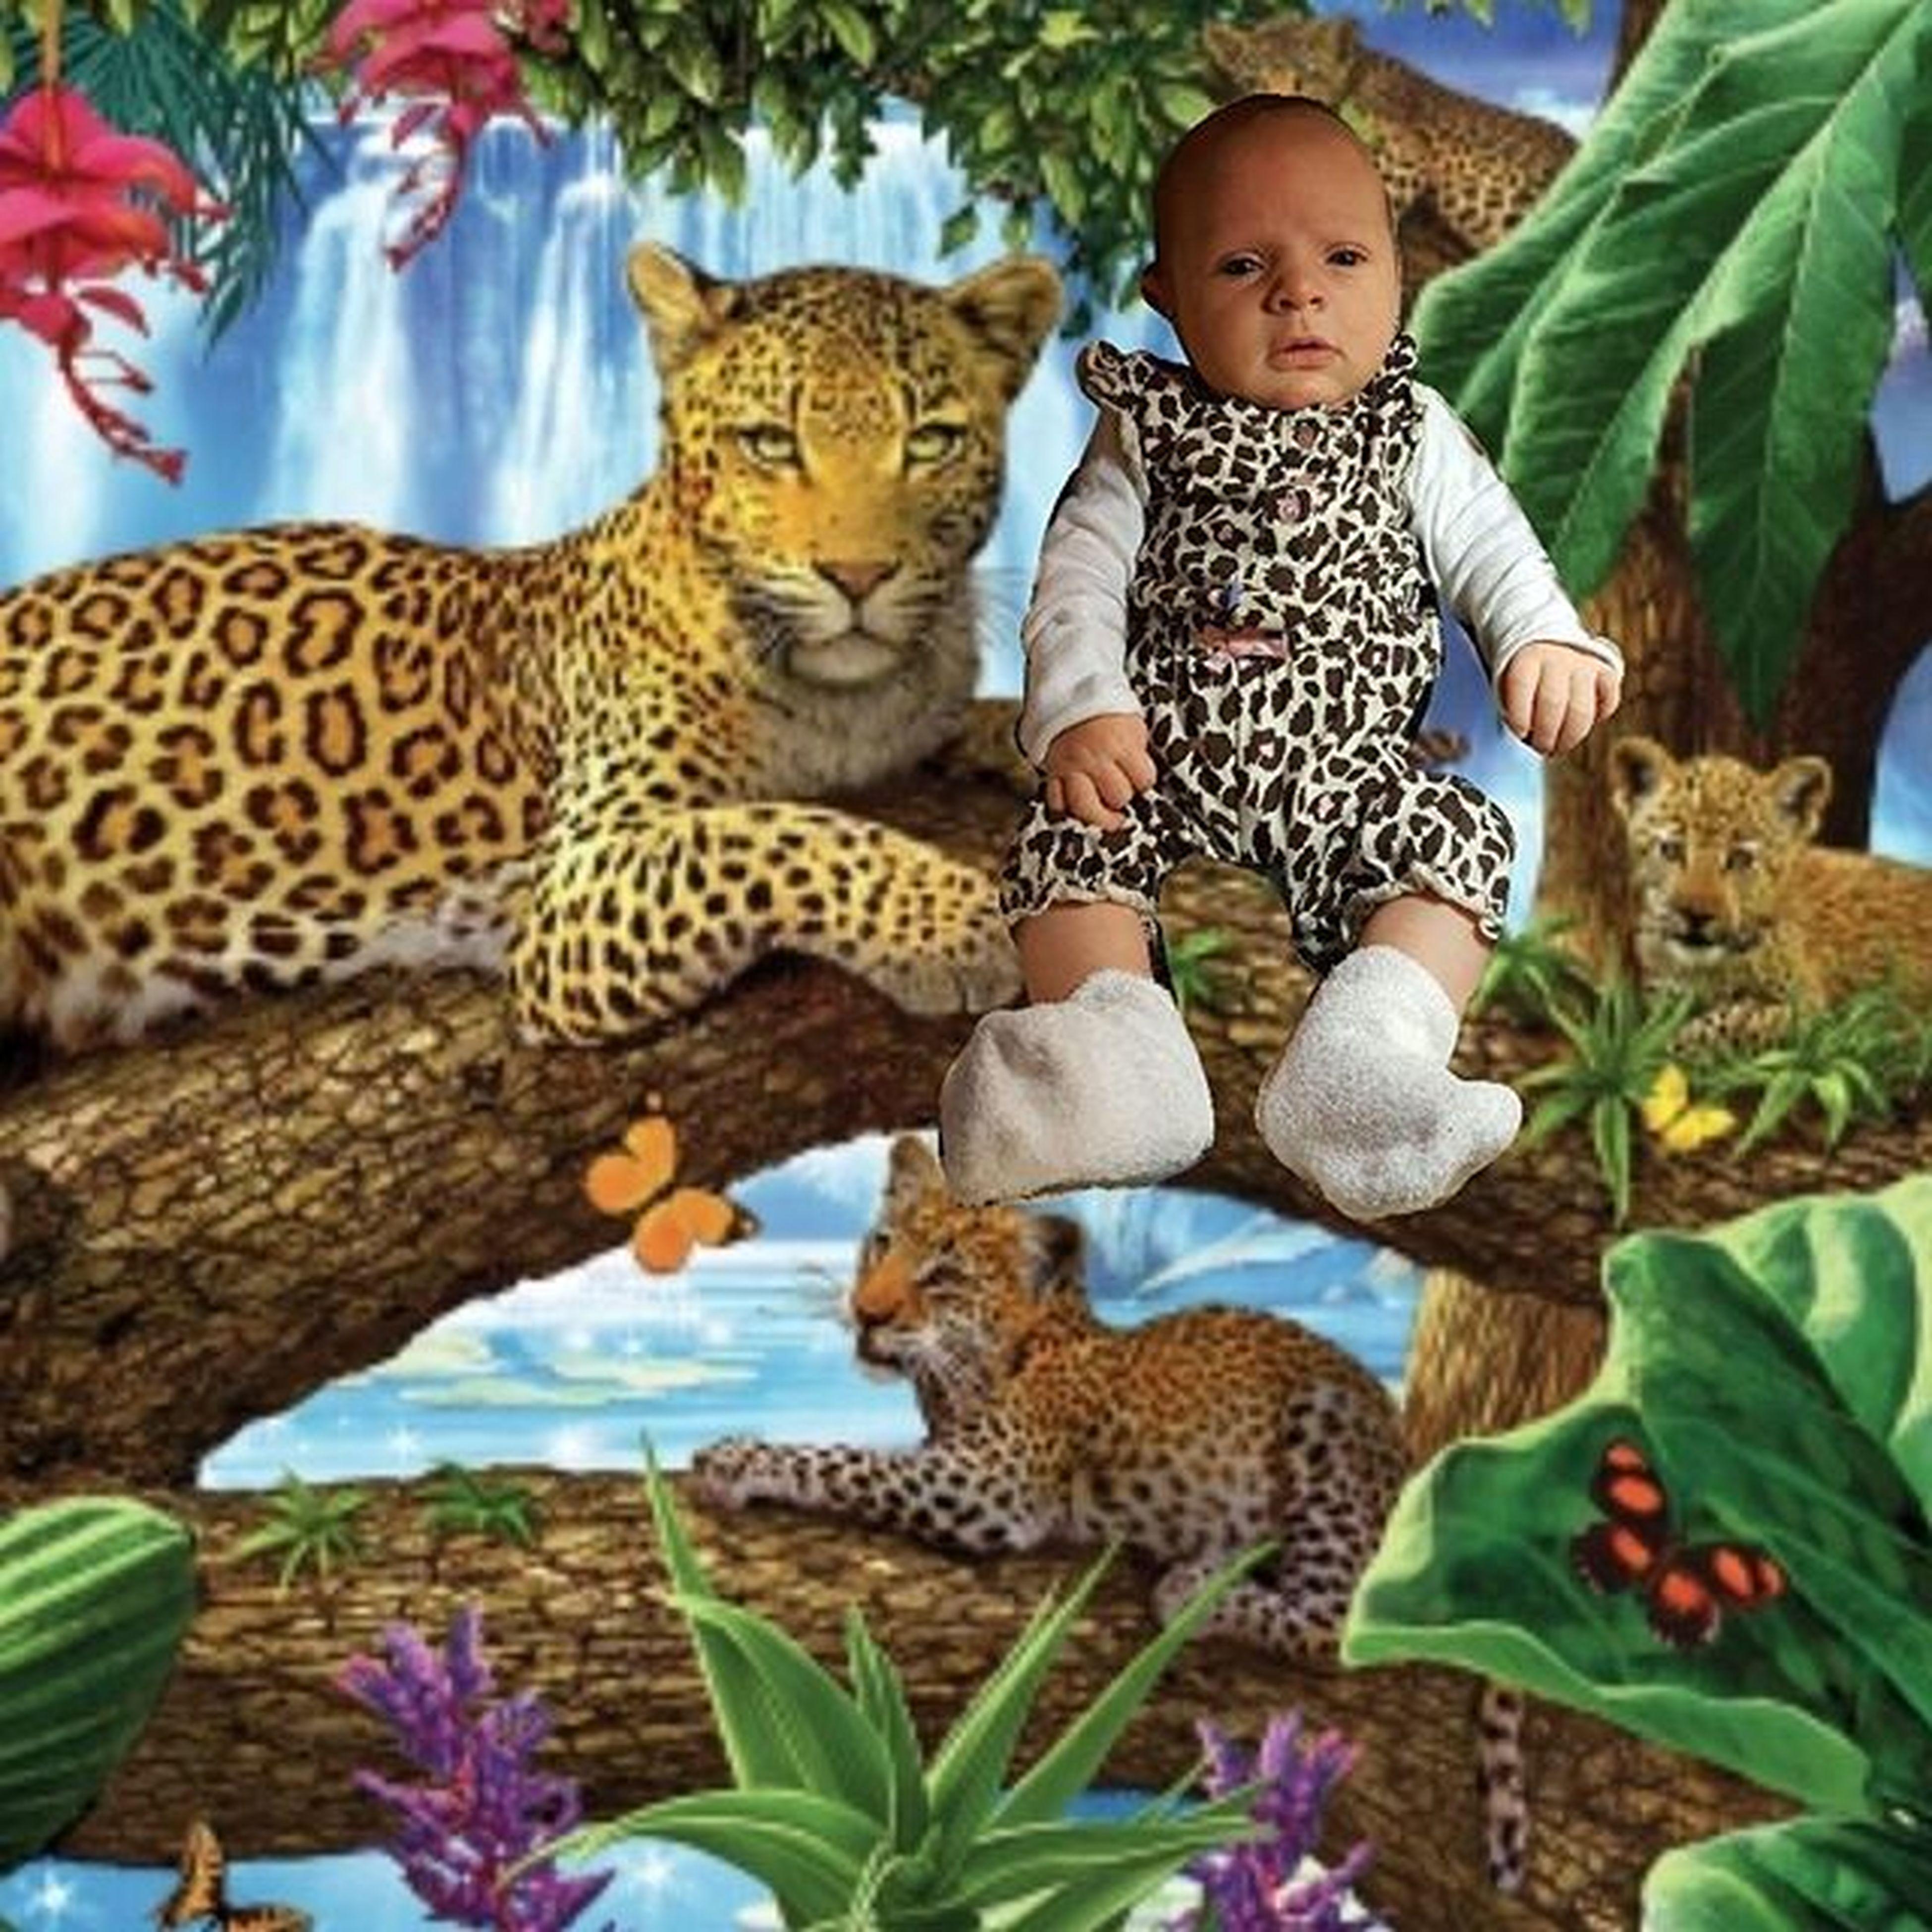 Leopardbaby Mightyjungle Raileyroo Rairai Raileymichayla Raileyholland Sheisgonnahatemewhenolder Canthelpmyself Socute Raileyroar